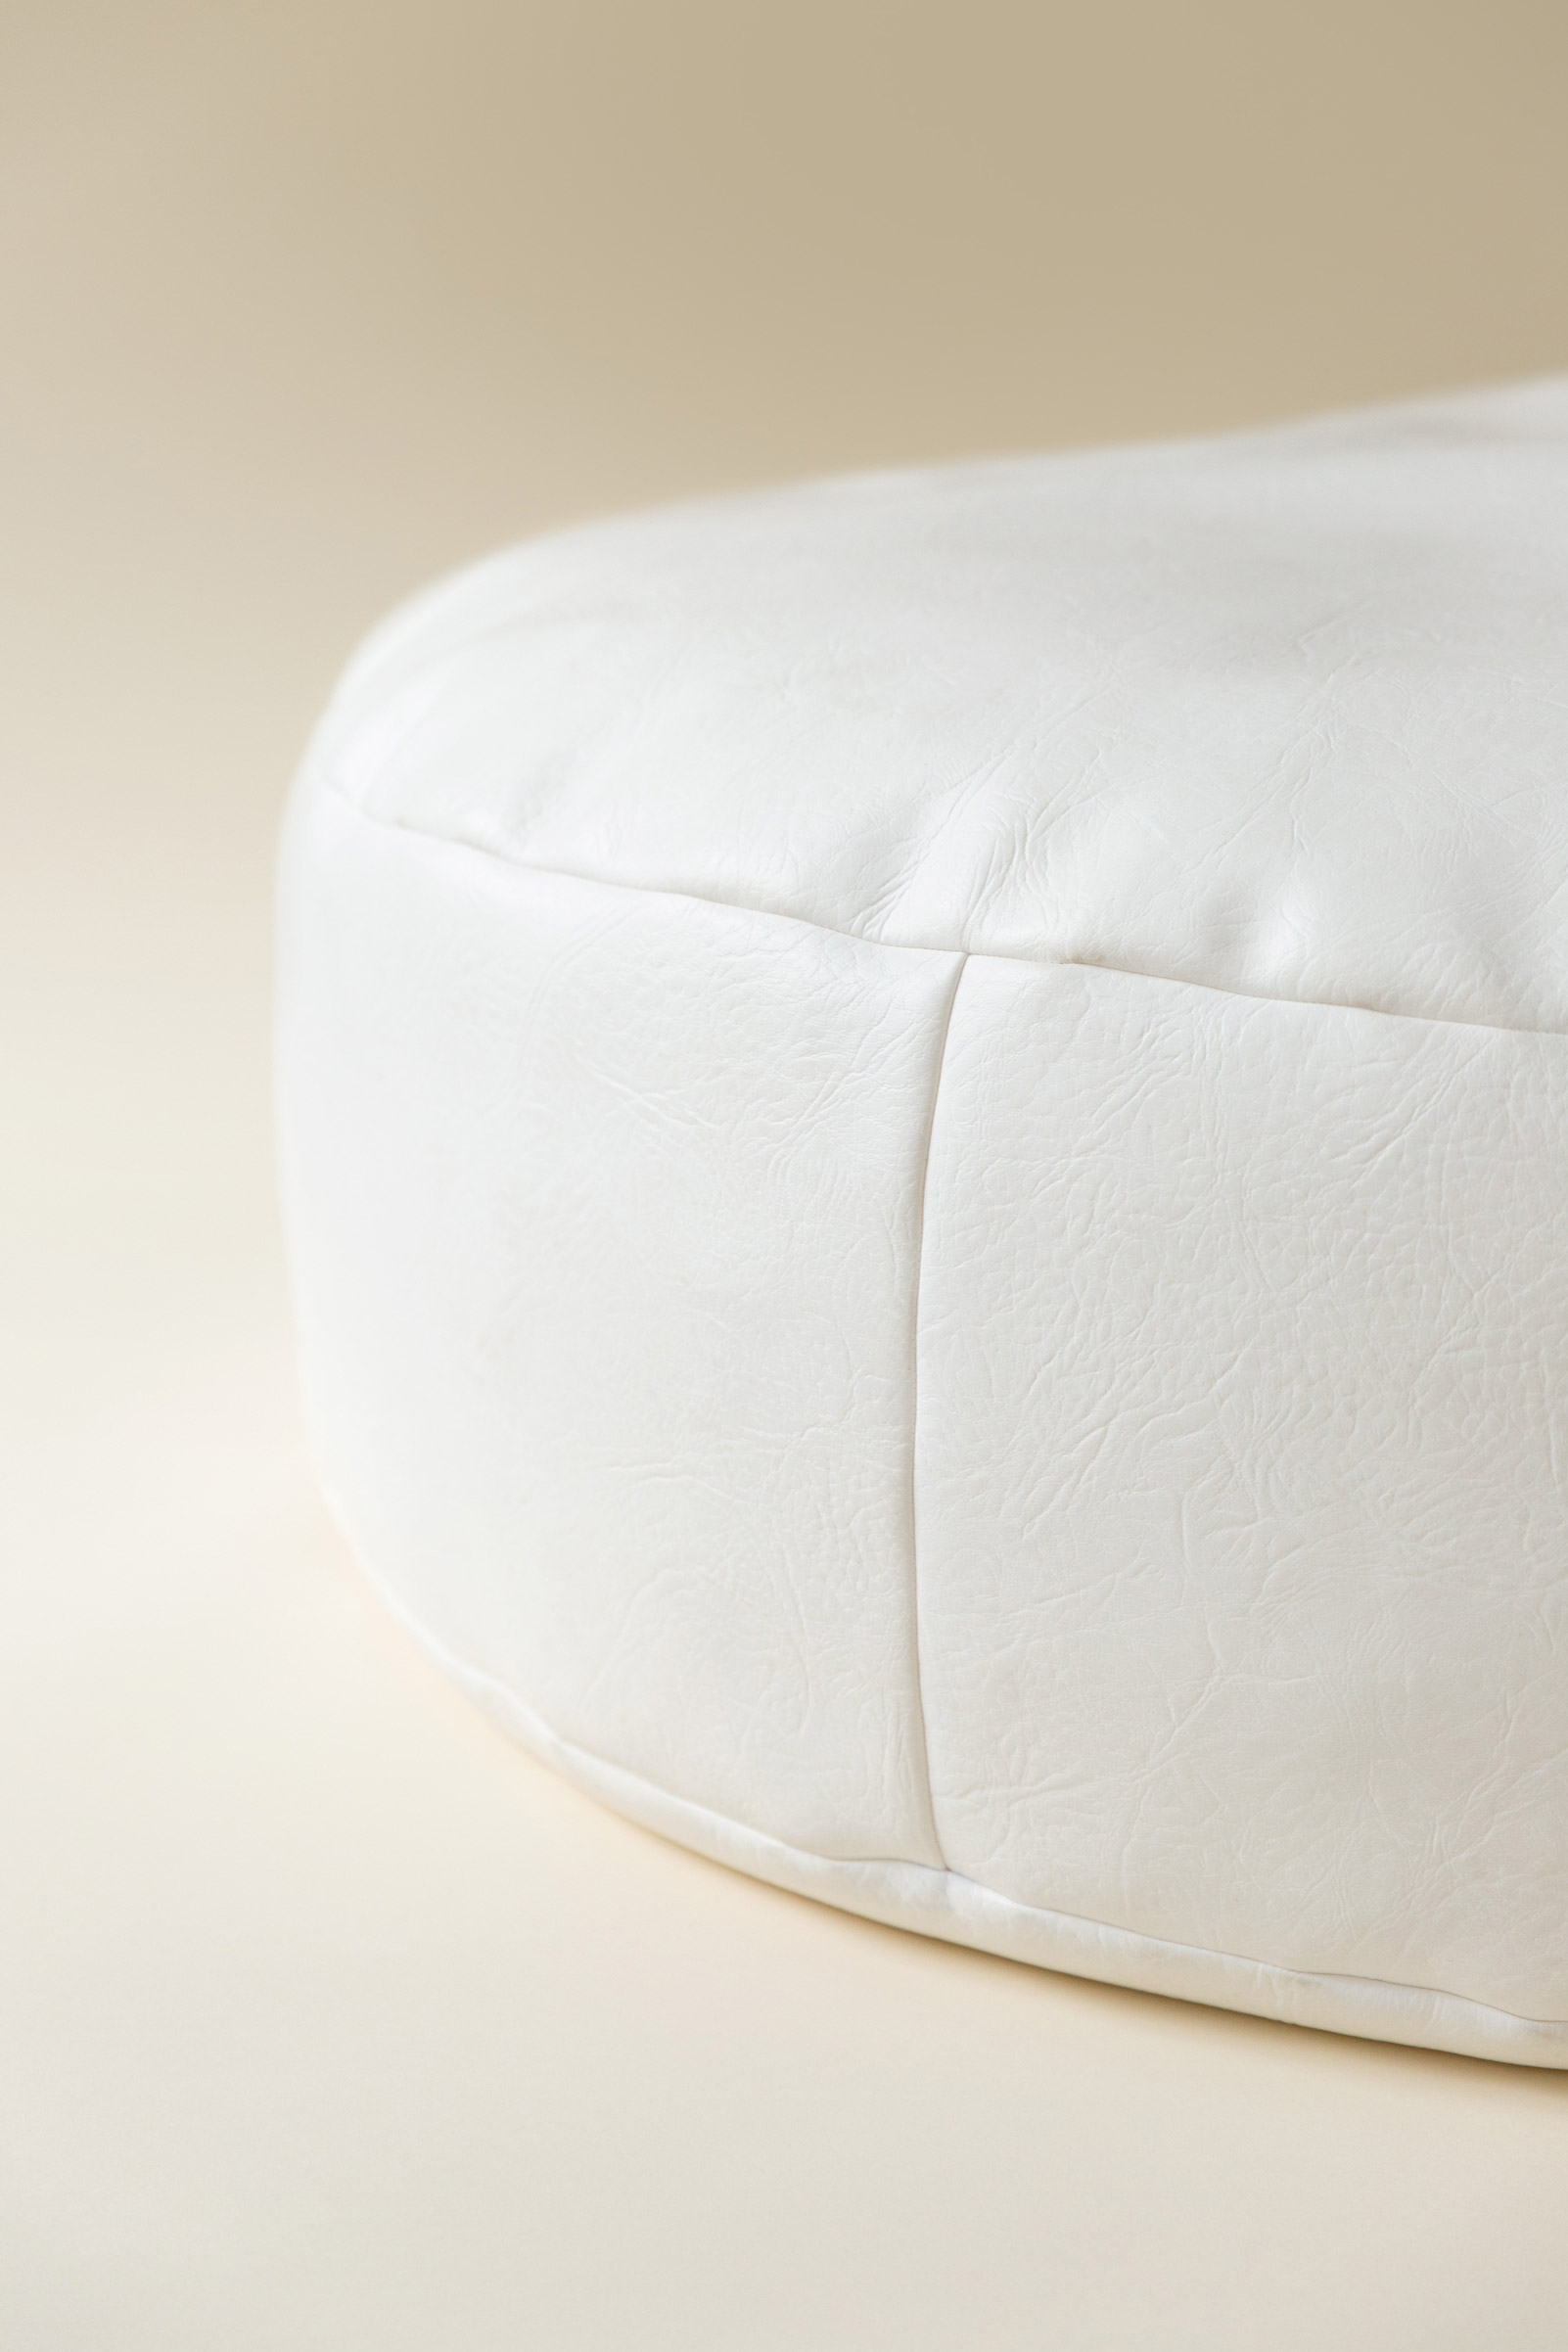 Newborn posing beanbag on a cream seamless paper backdrop